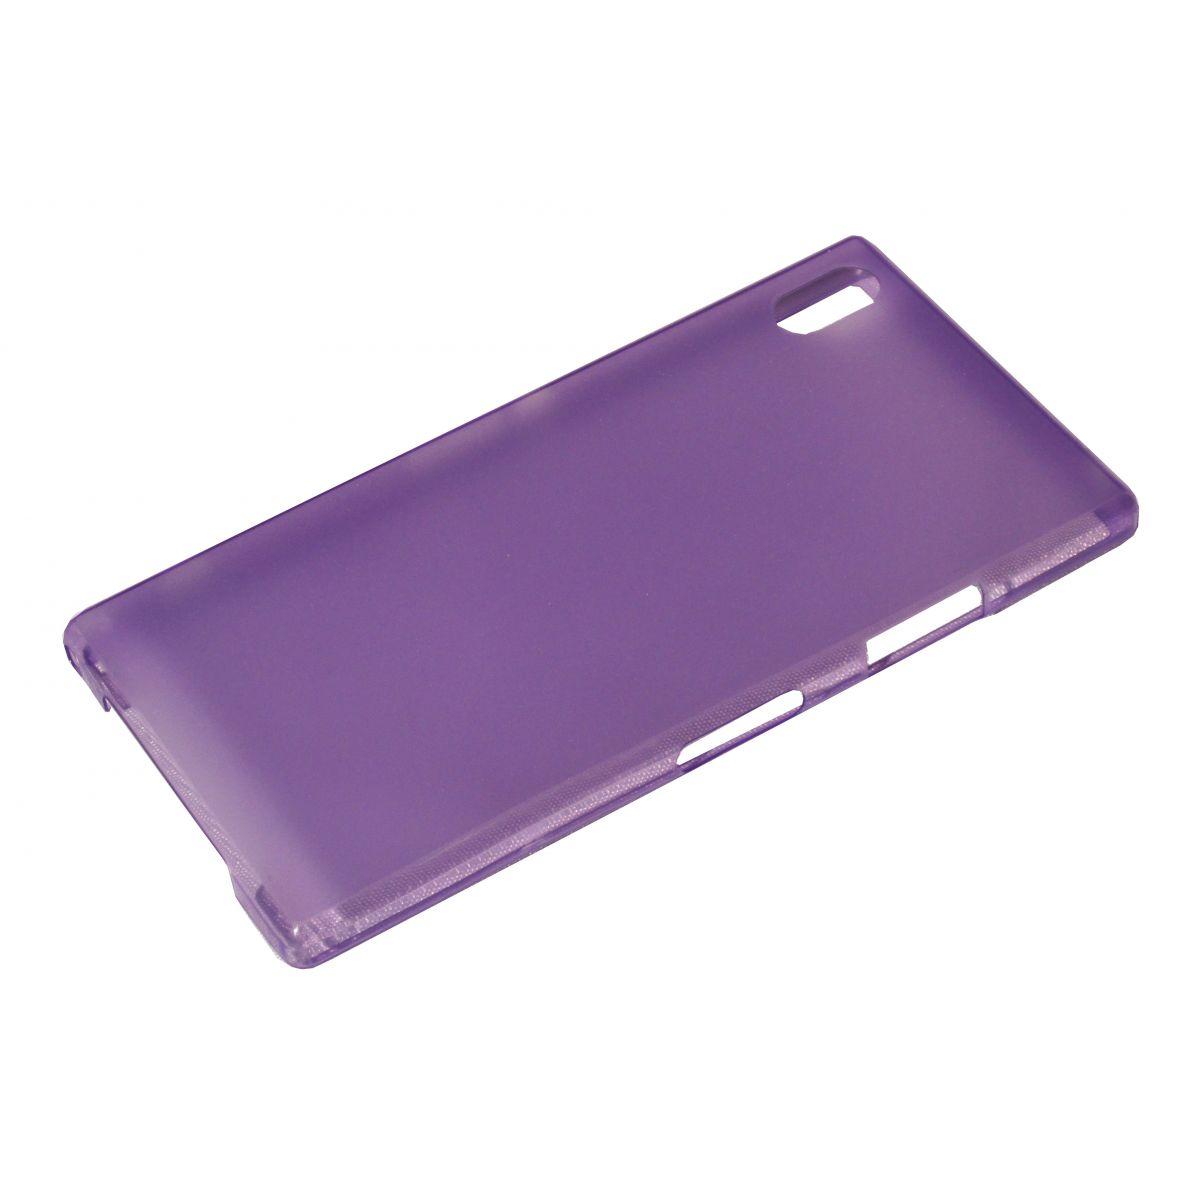 Capa Ultra Slim Sony Xperia Z1 C6903 - Lilás